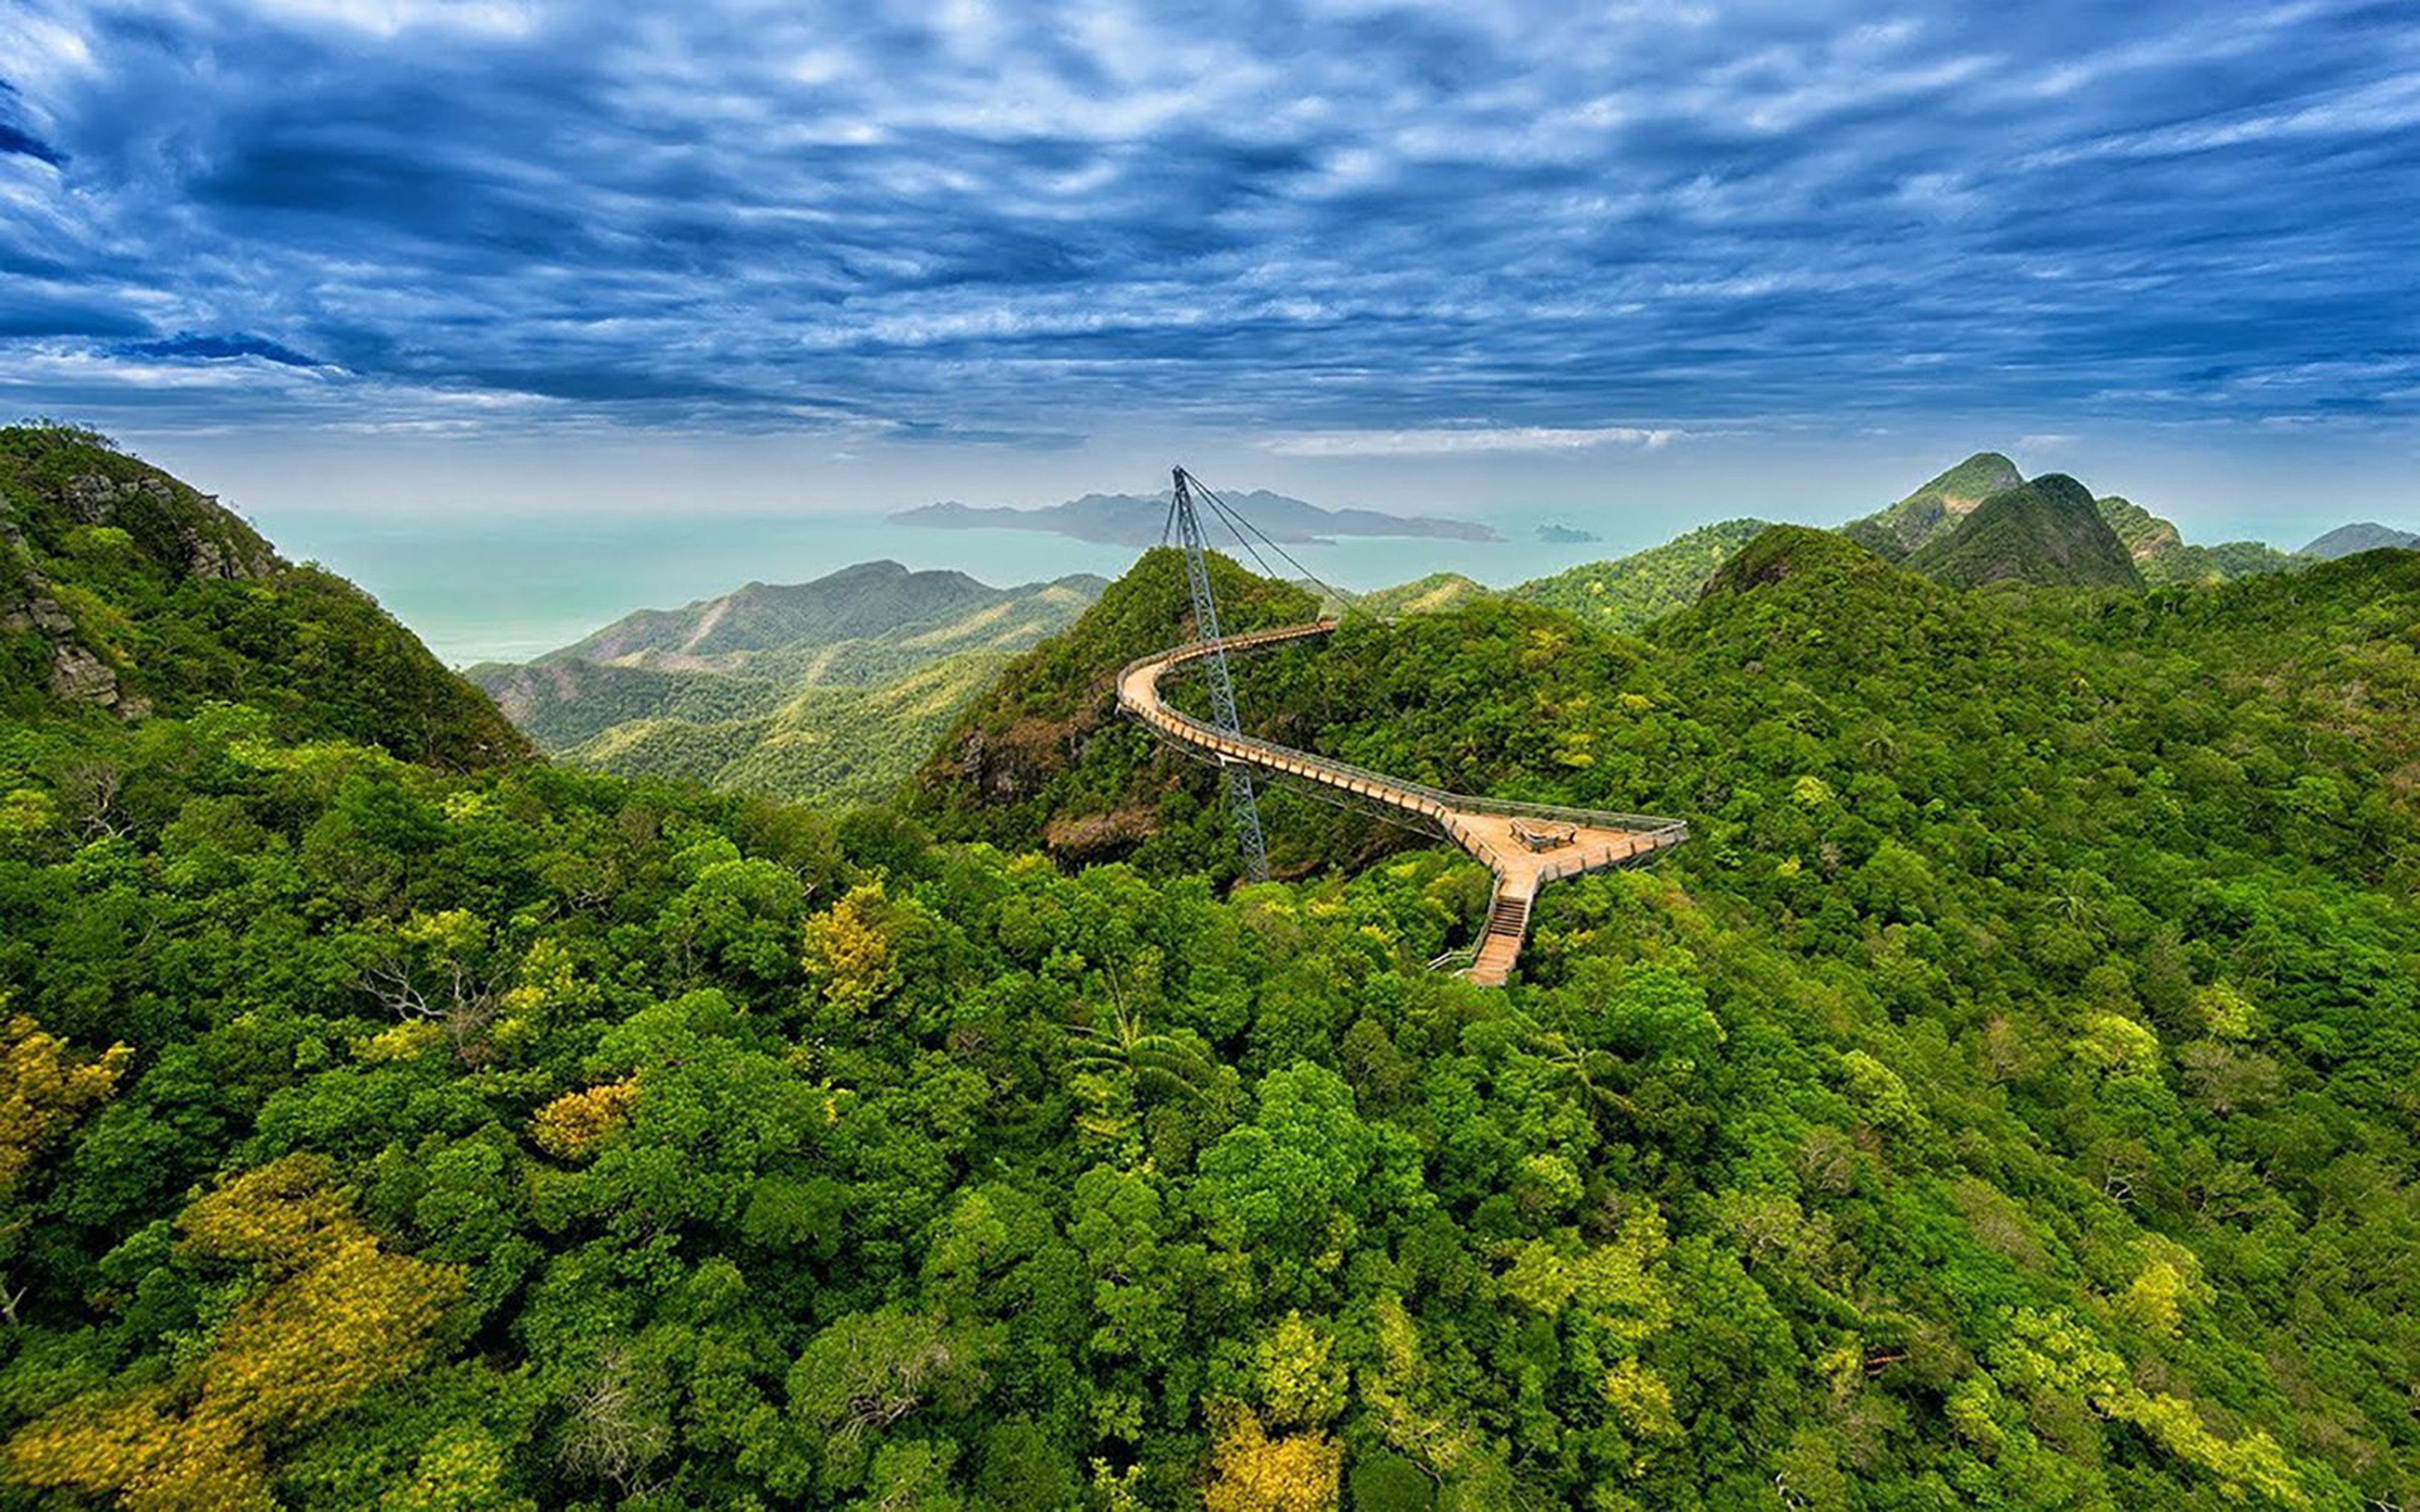 Hd Exotic Car Wallpapers 1920x1080 Langkawi Sky Blue Green Forest Bridge Malaysia Wallpaer Hd